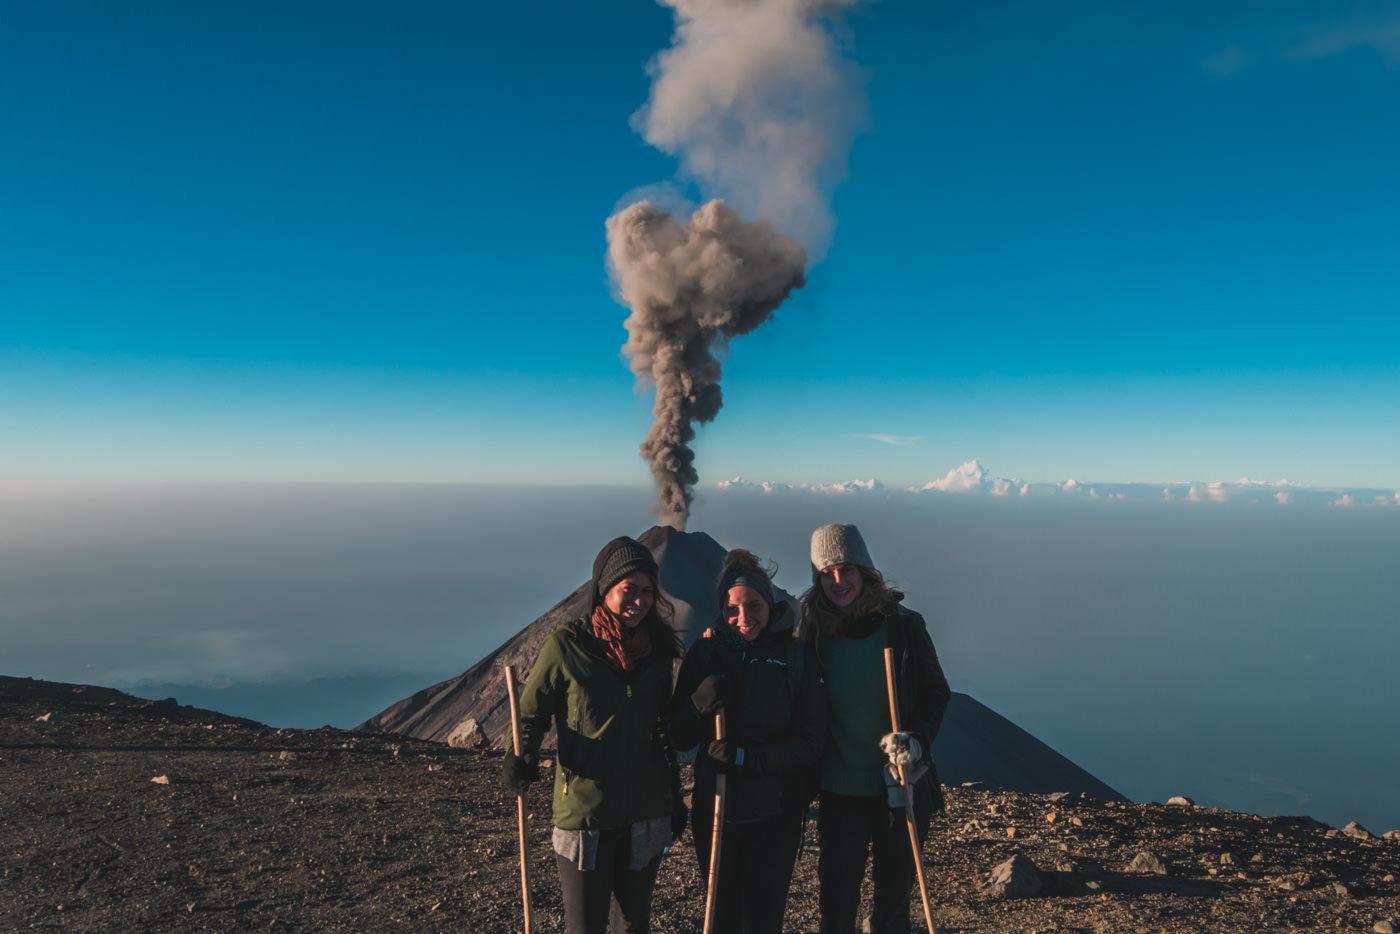 Gruppenbild auf dem Gipfel des Vulkan Acatenango